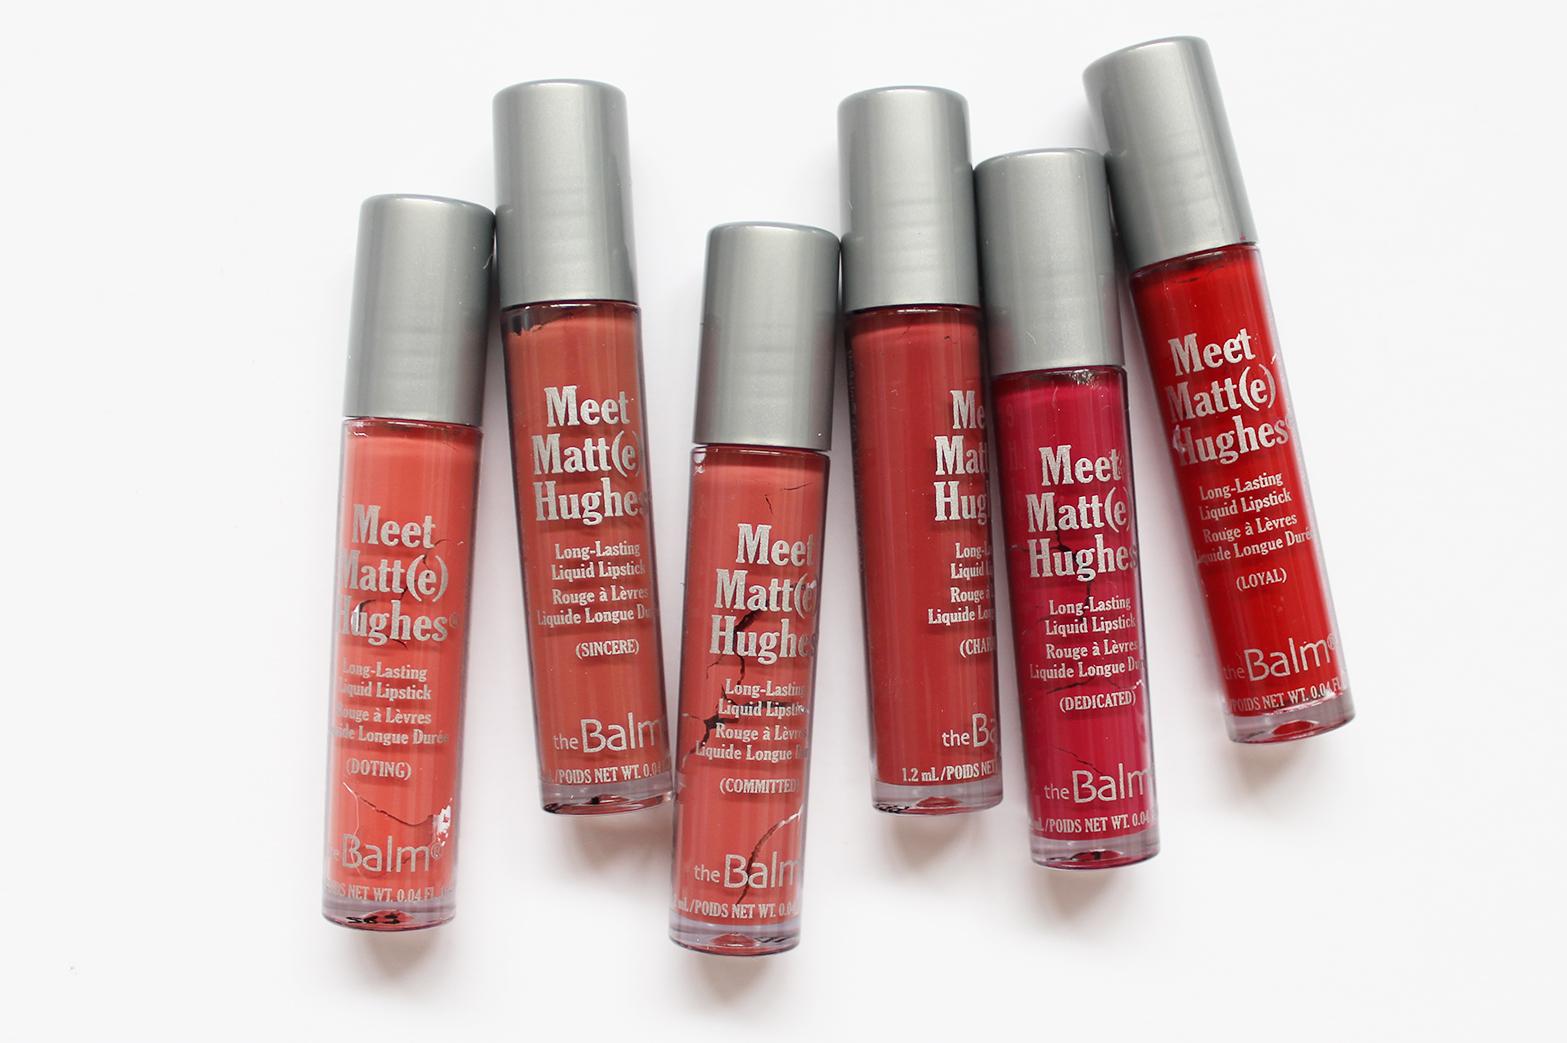 THEBALM | Meet Matt(e) Hughes Liquid Lipstick Set - CassandraMyee